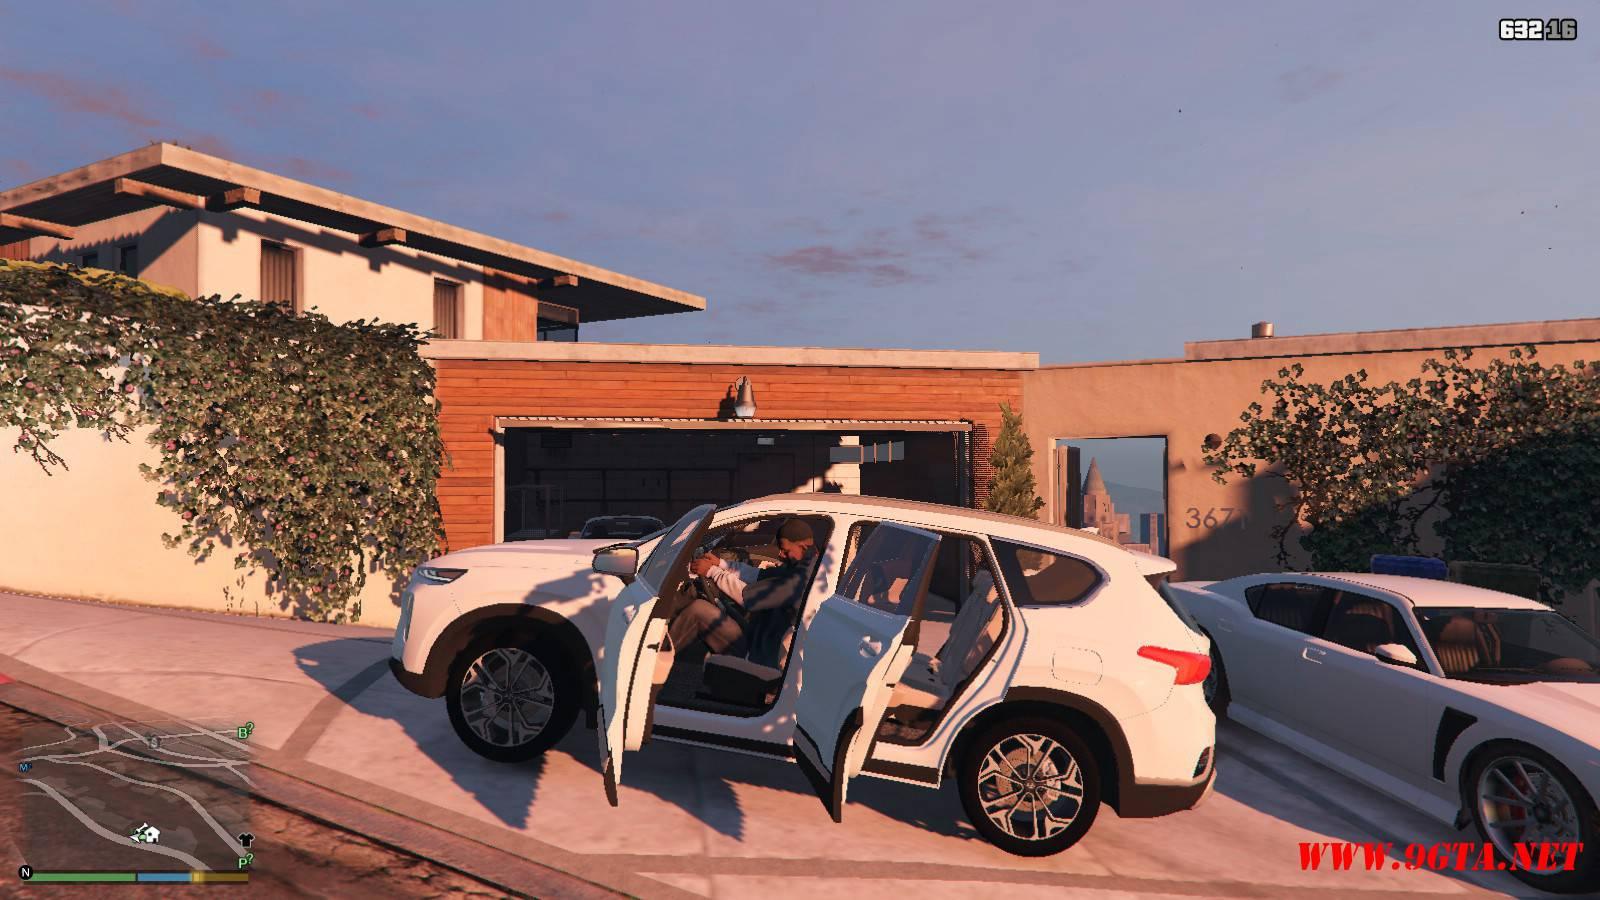 2019 Huyndai Santa Fe GTA5 mods (13)